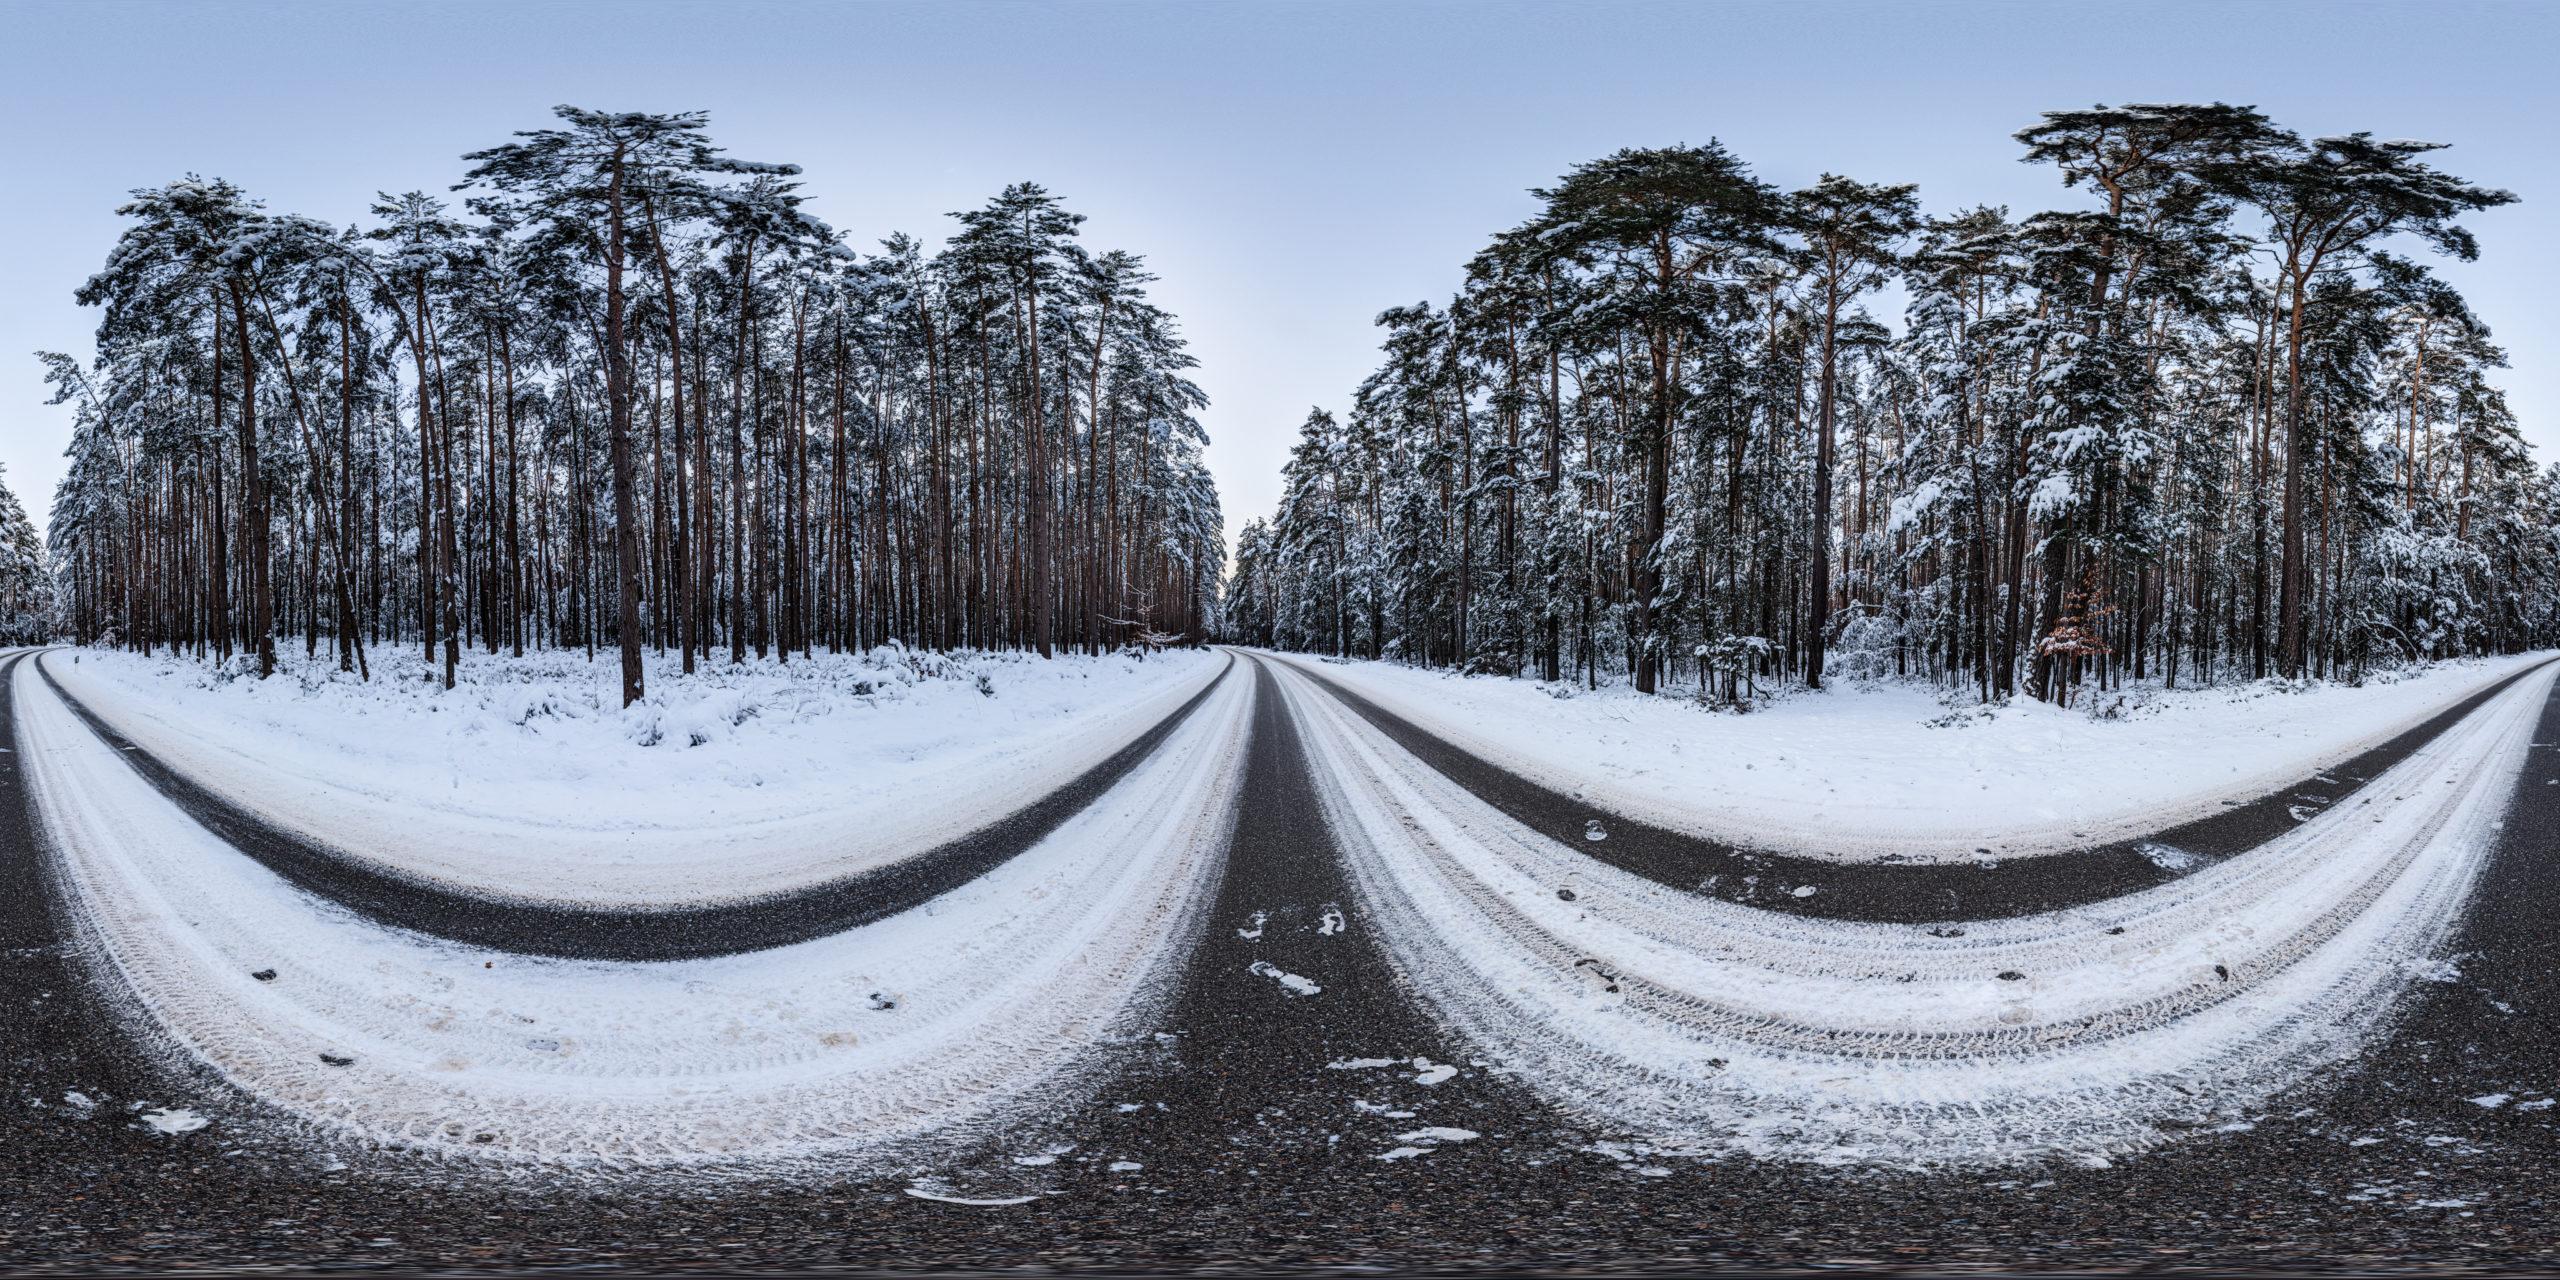 HDRI-Skies-Snowy-Road-Rittersbach